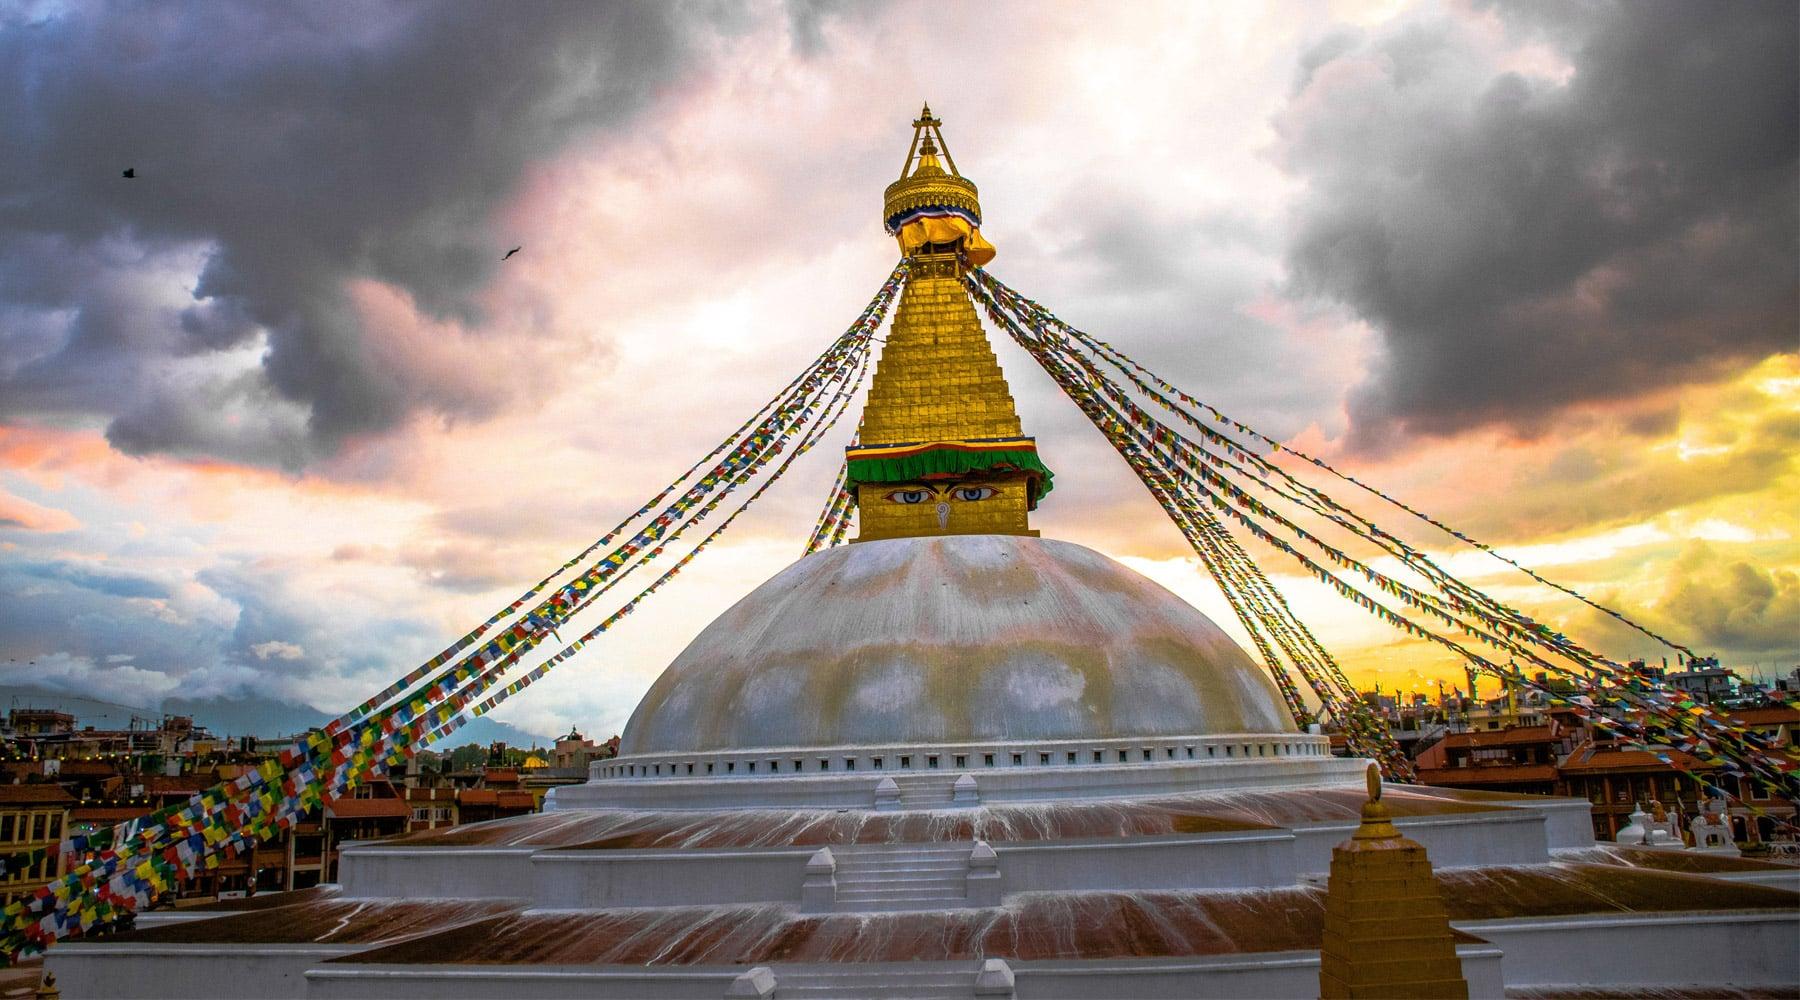 Boudhanath Stupa, Nepal - One of The World's Greatest Stupas 1